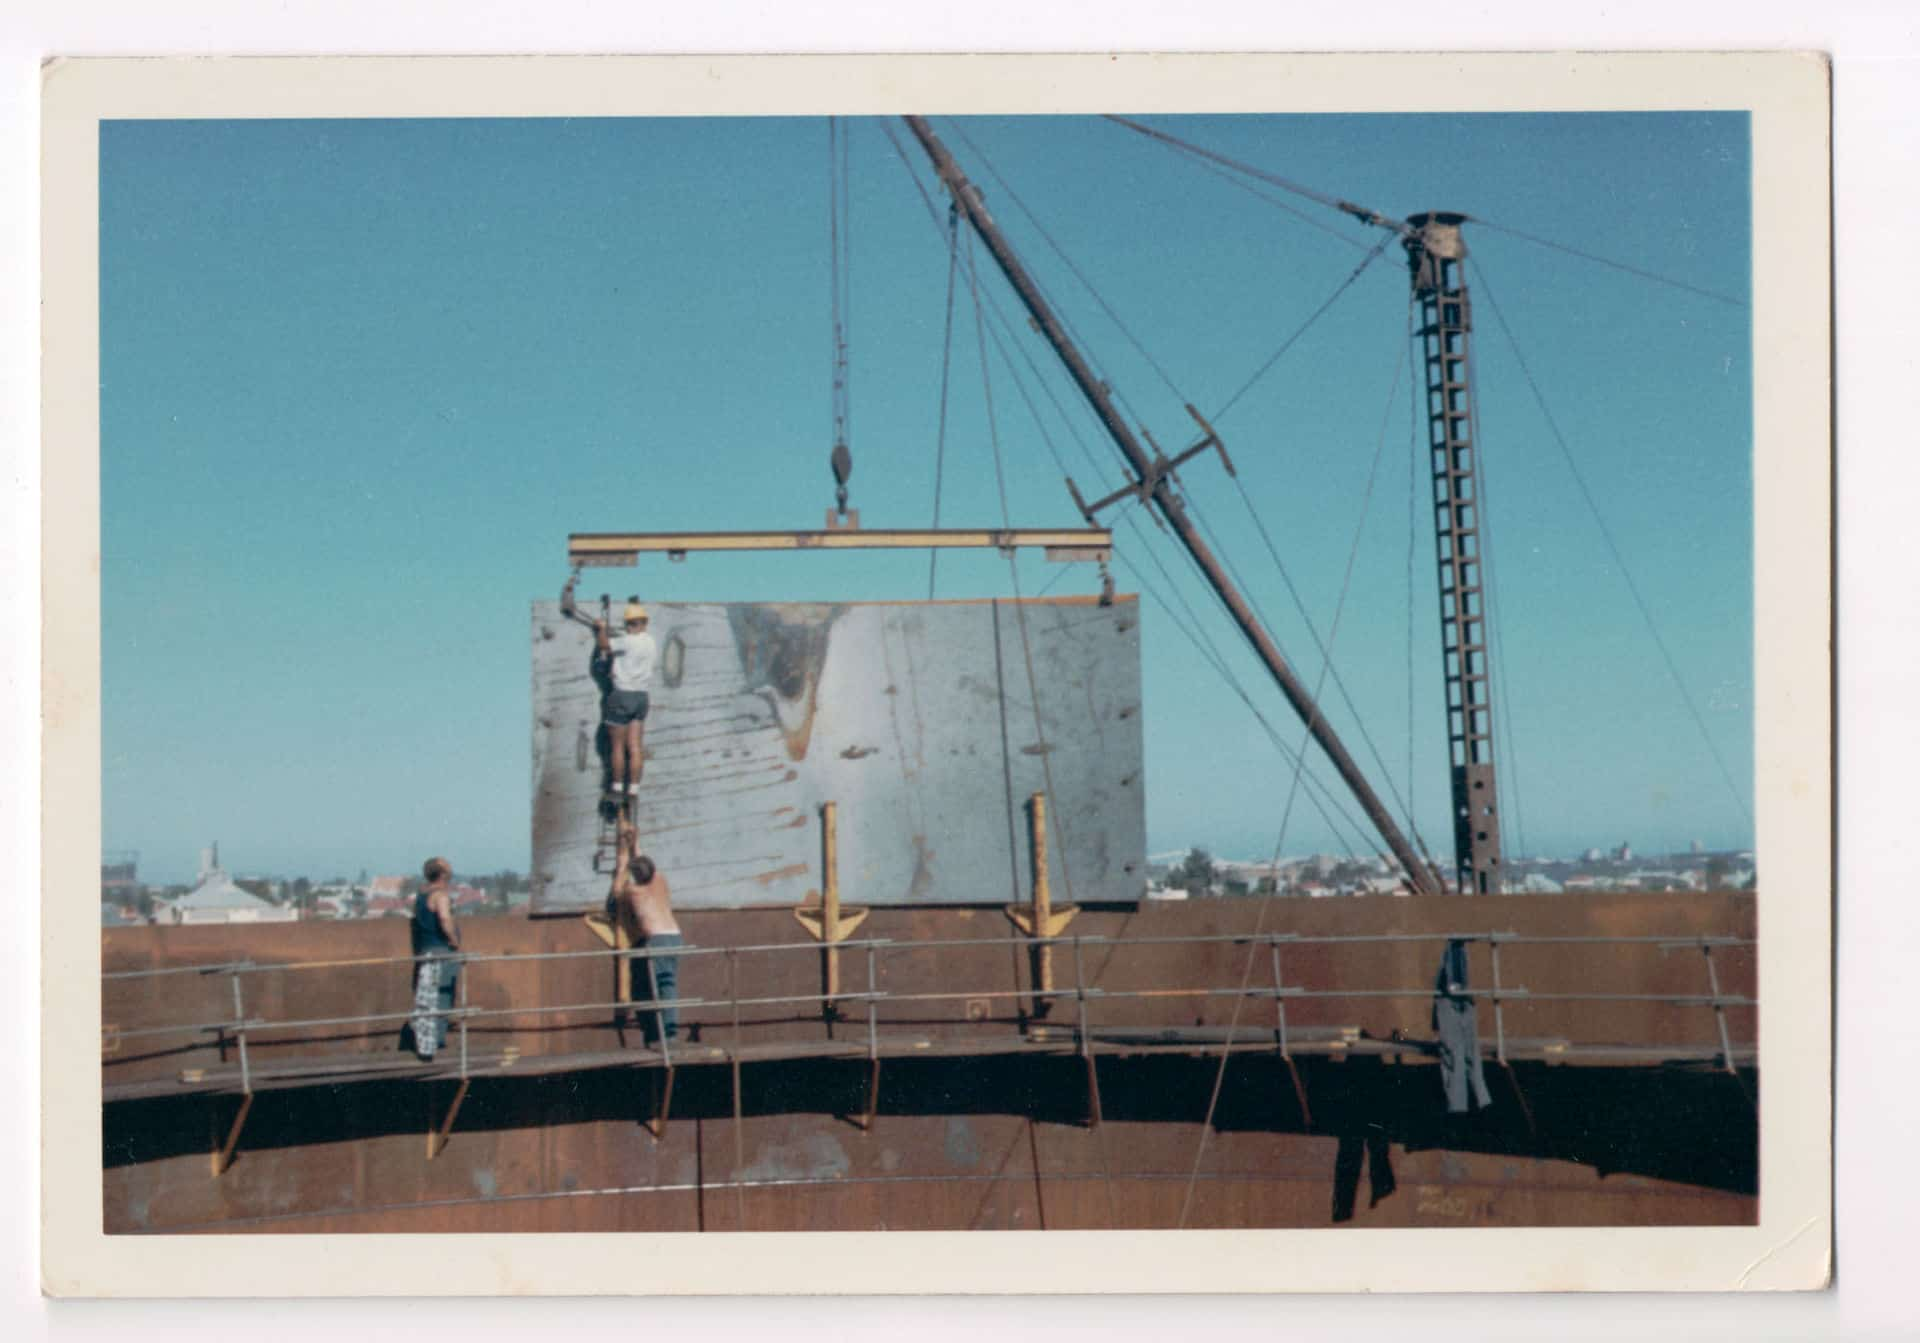 Inscription on back reads: At 36 ft, Grain silos left, 3 1/2 million bushels capacity